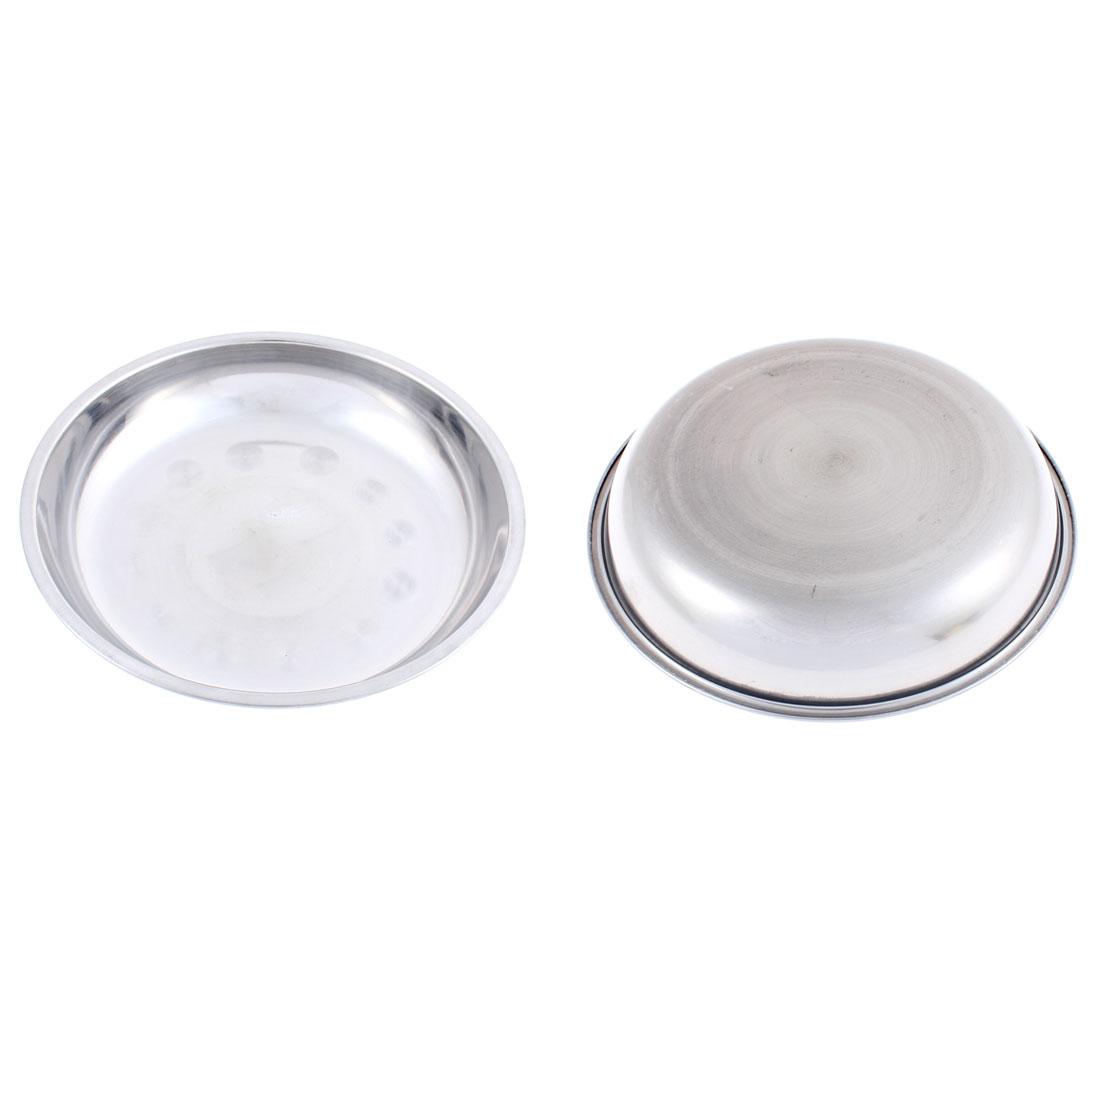 Kitchen Dinner Dish Food Round Shape Plates Silver Tone 18cm x 3cm 2Pcs